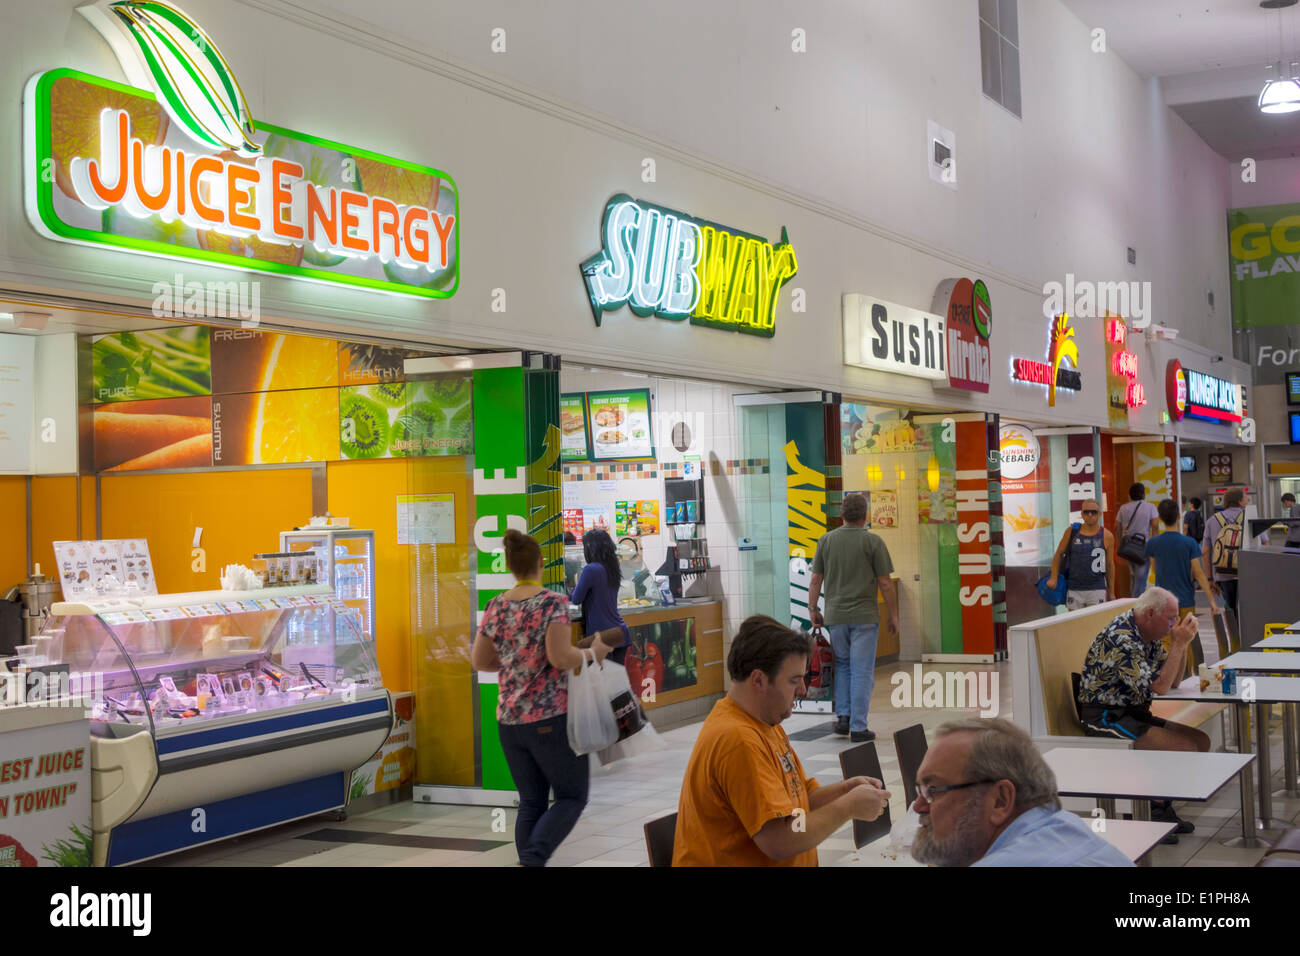 Image gallery subway juice for Australian cuisine brisbane